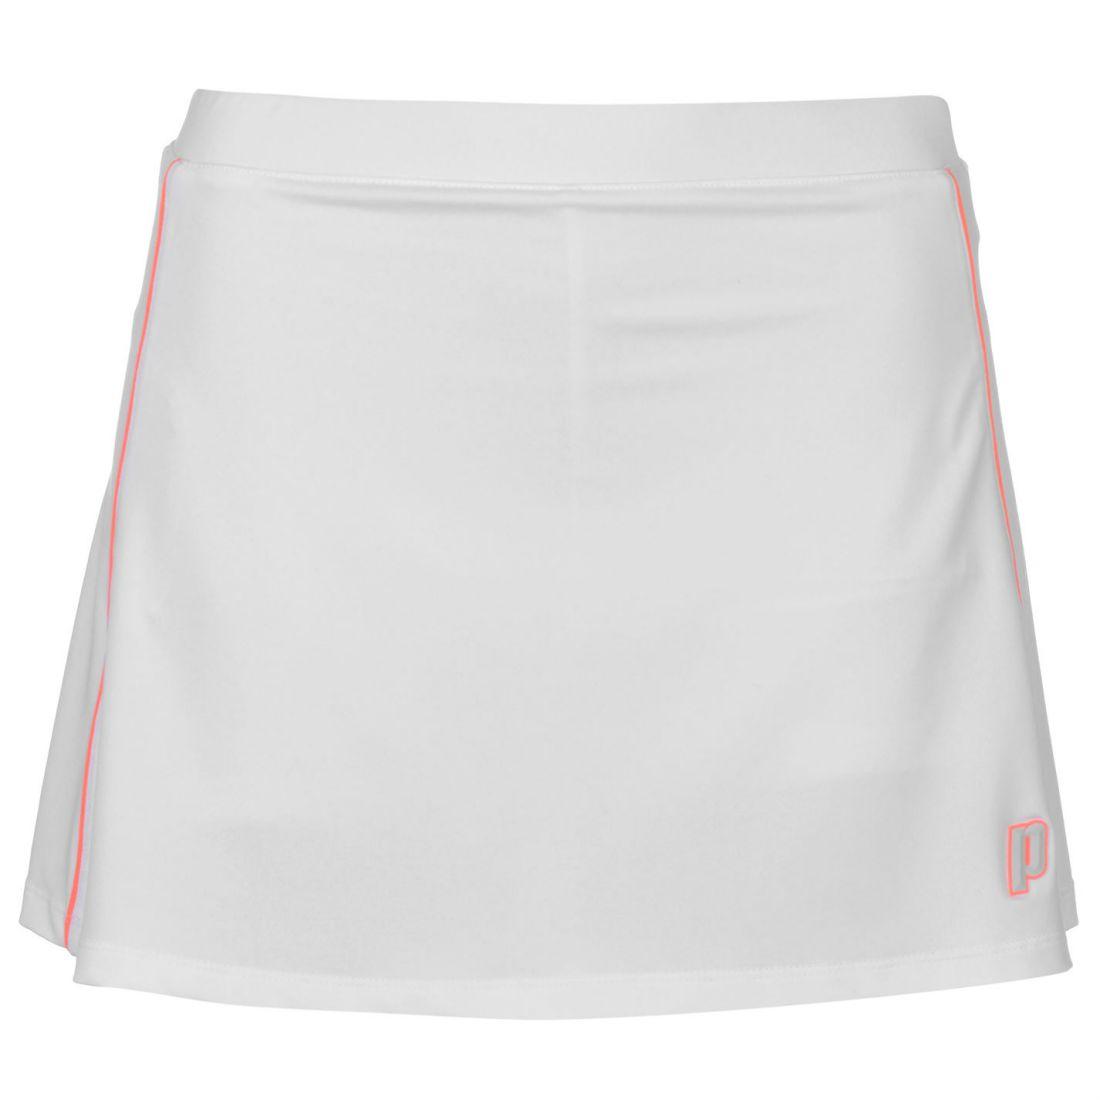 Prince Womens Tennis Training Short Performance Shorts Pants Trousers